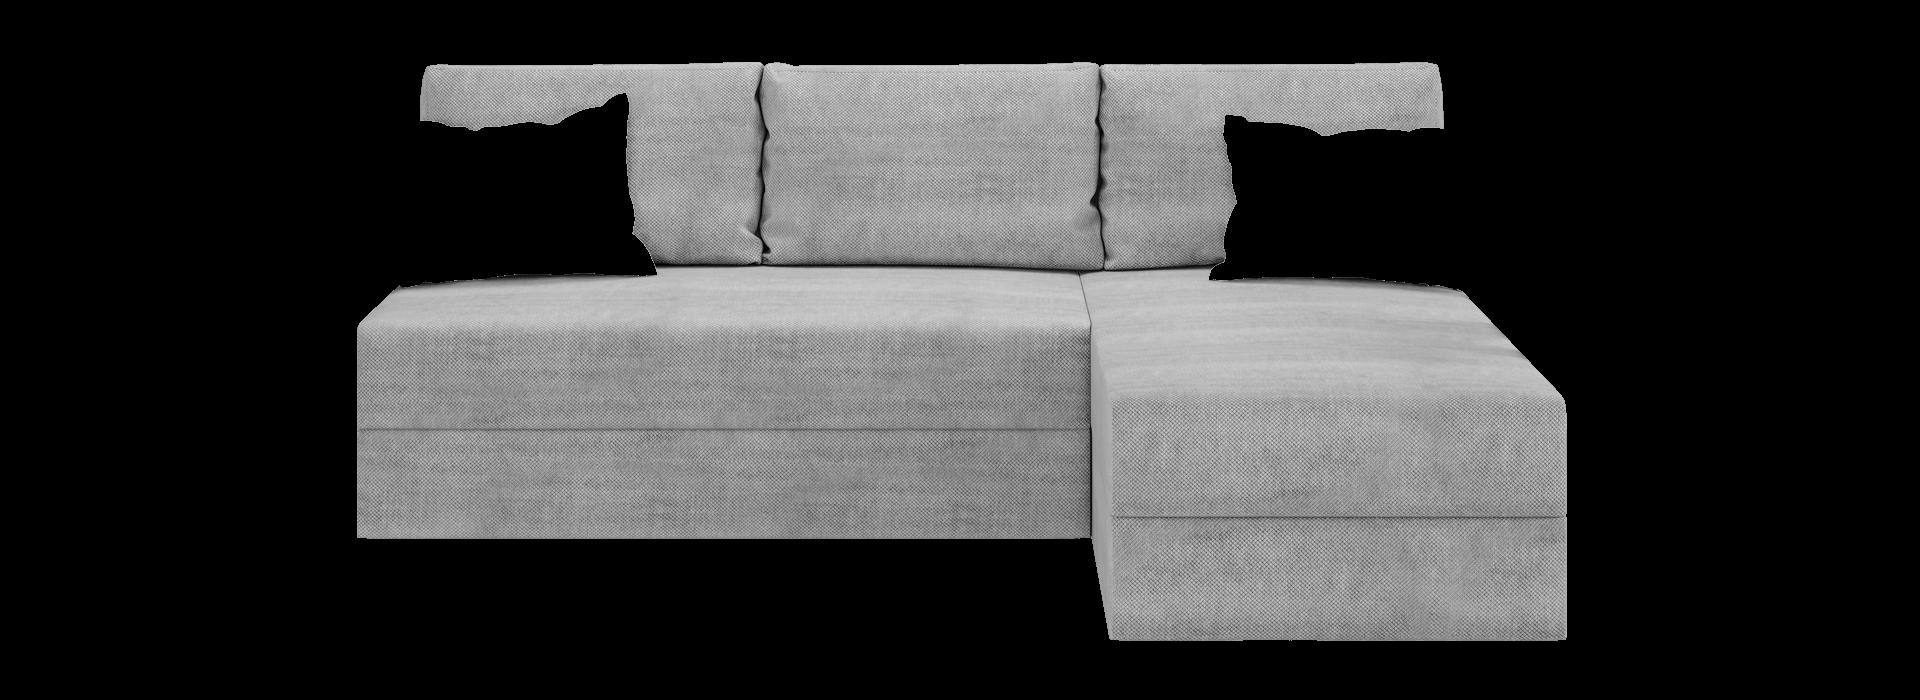 Тамми-5 угловой диван - маска 1